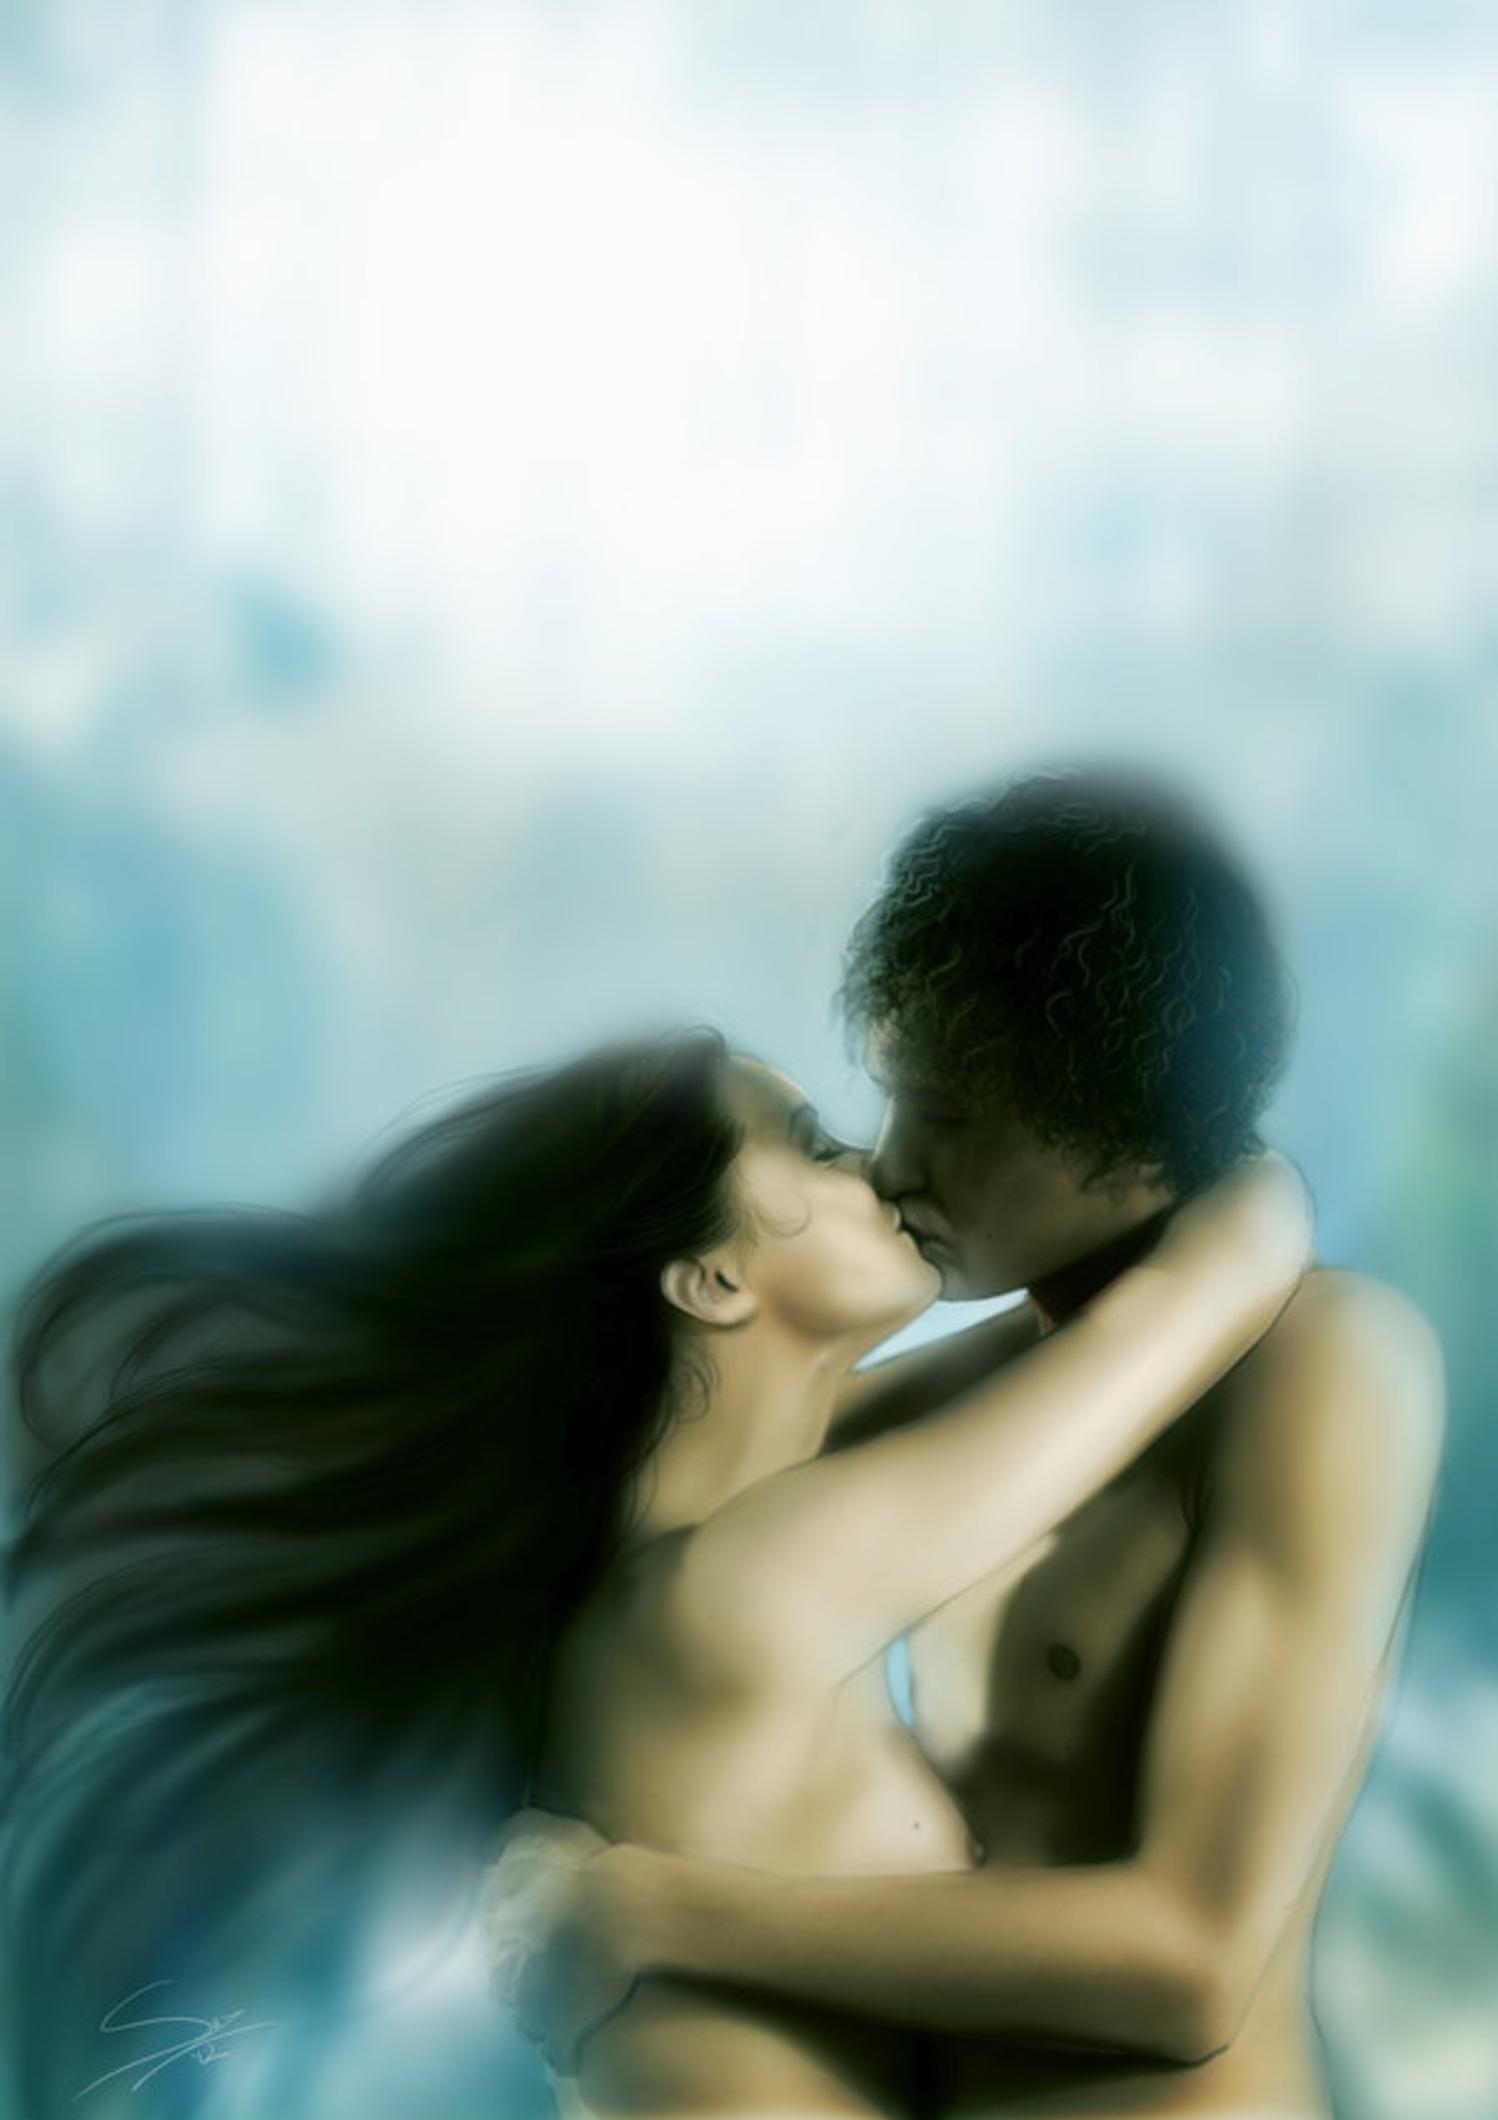 Поцелуй с брюнеткой картинки 20 фотография